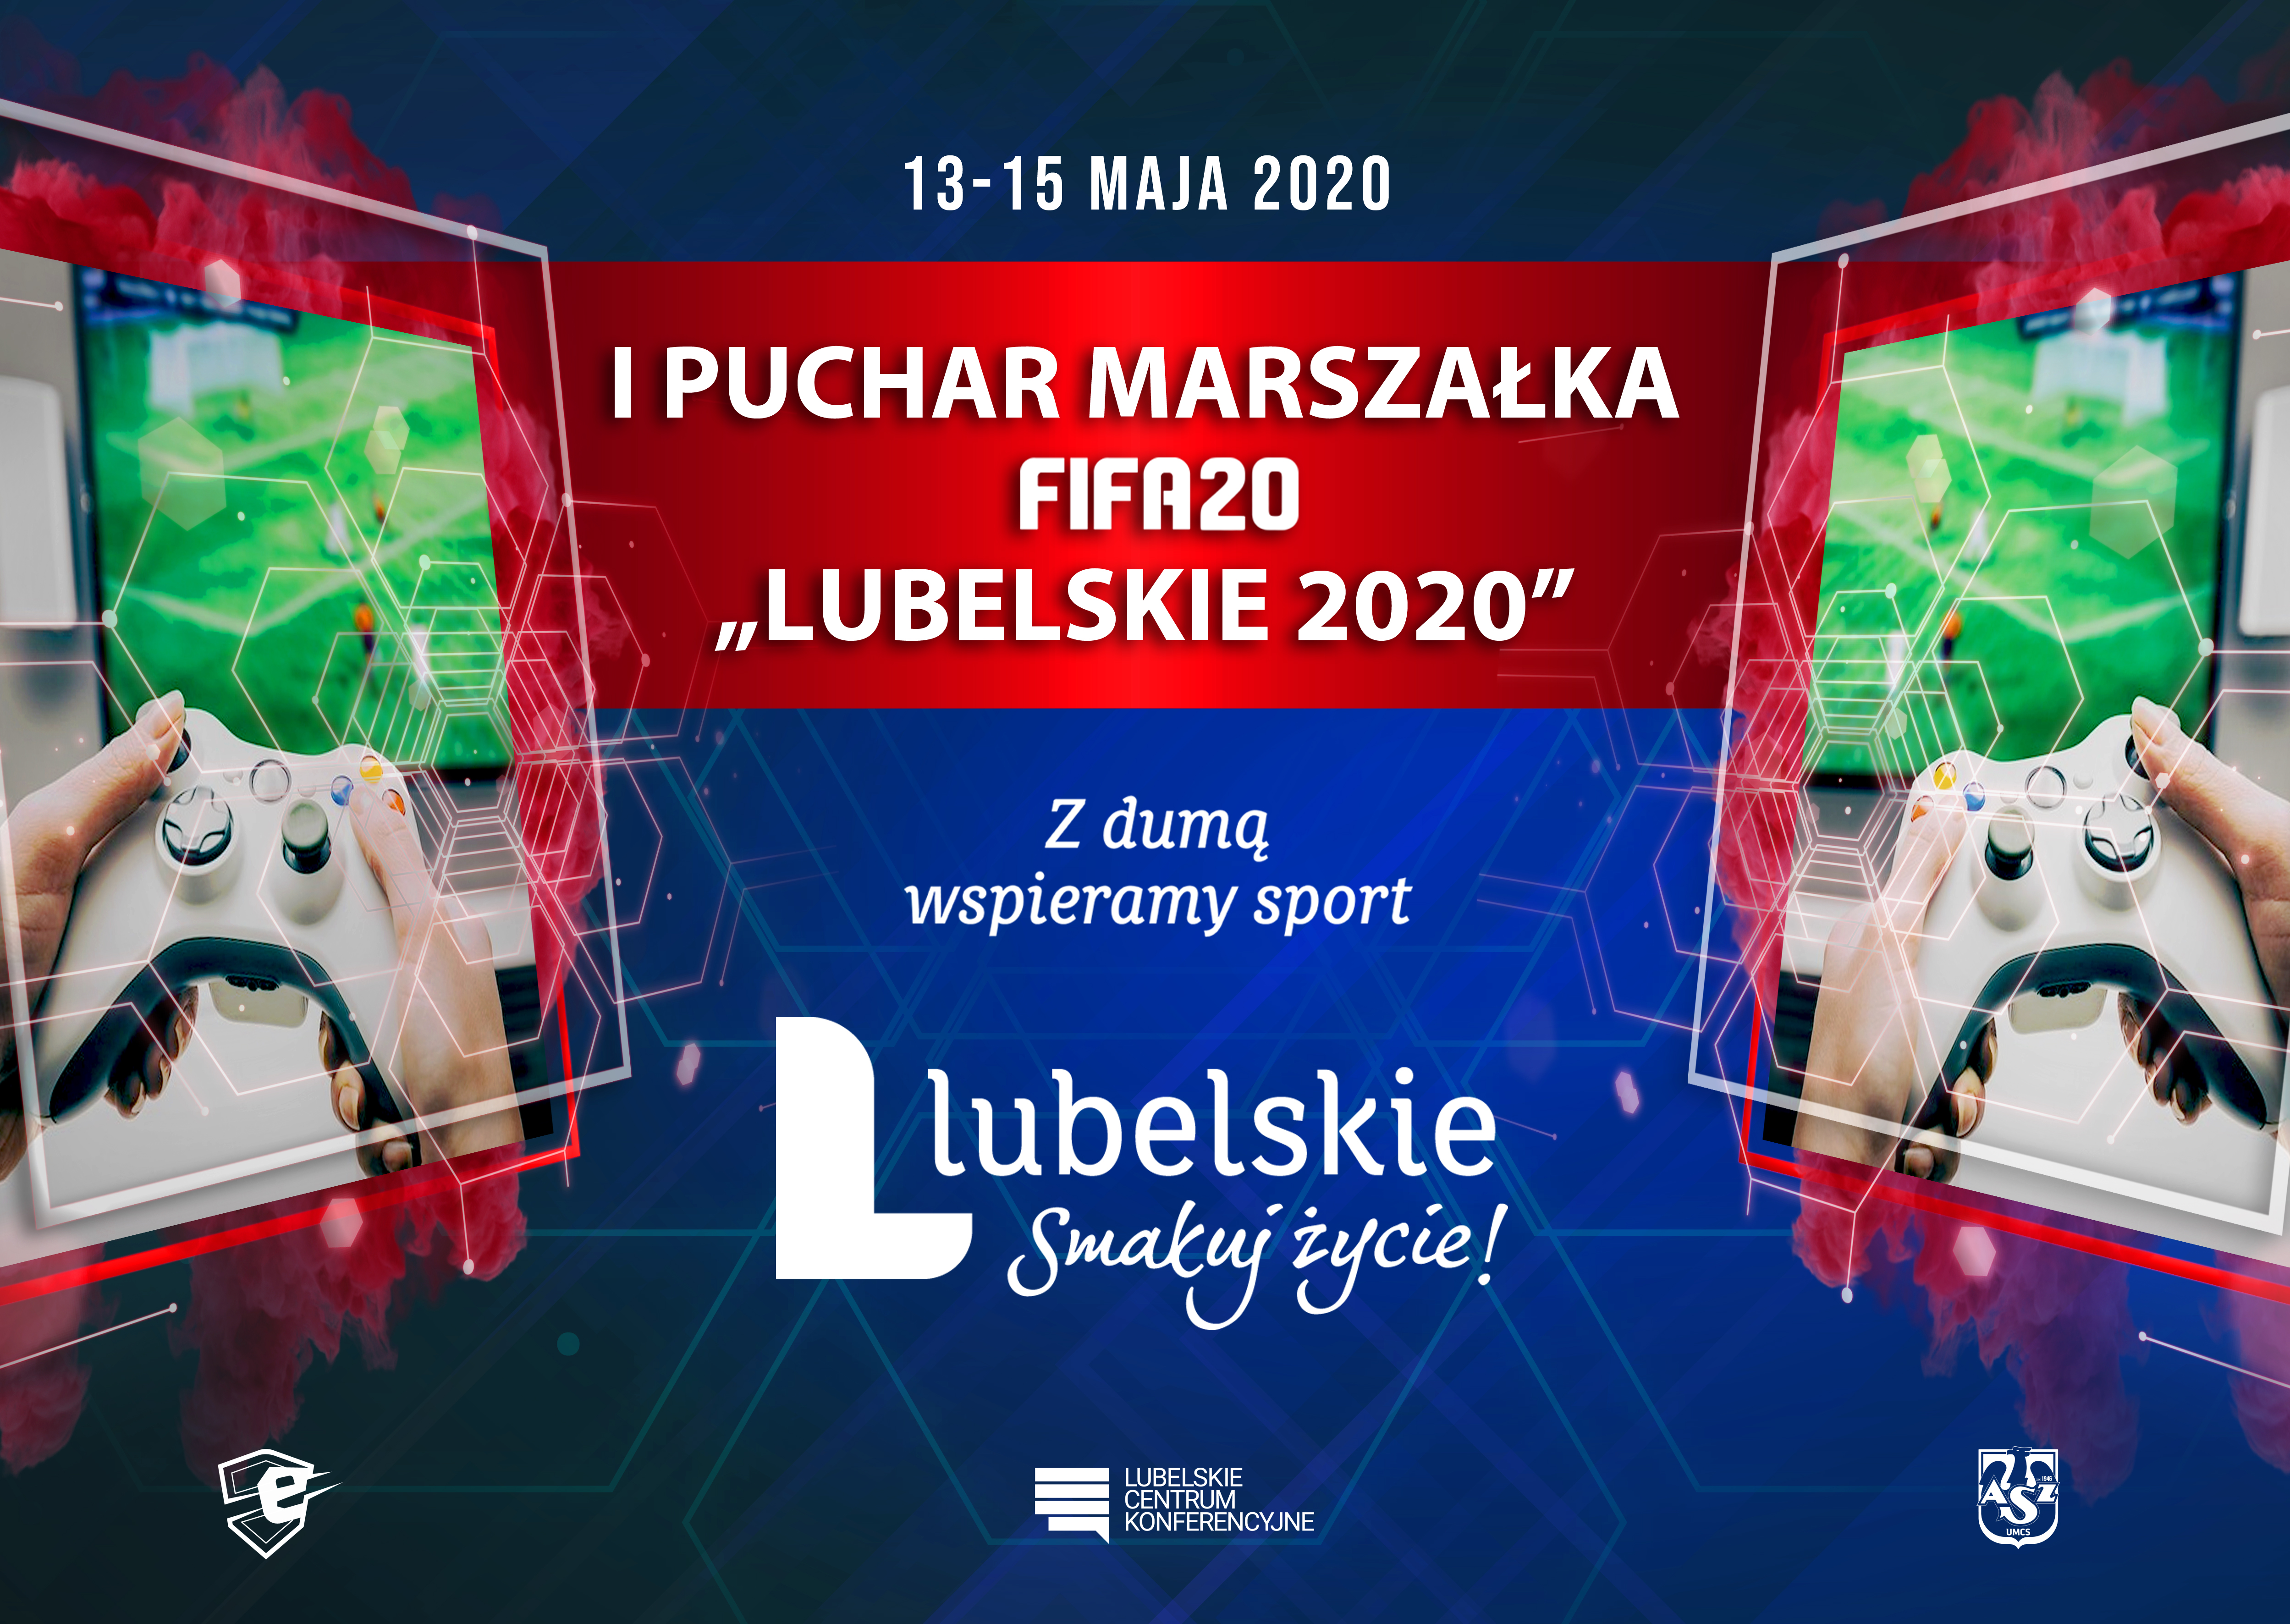 I Puchar Marszałka FIFA20 – Lubelskie 2020